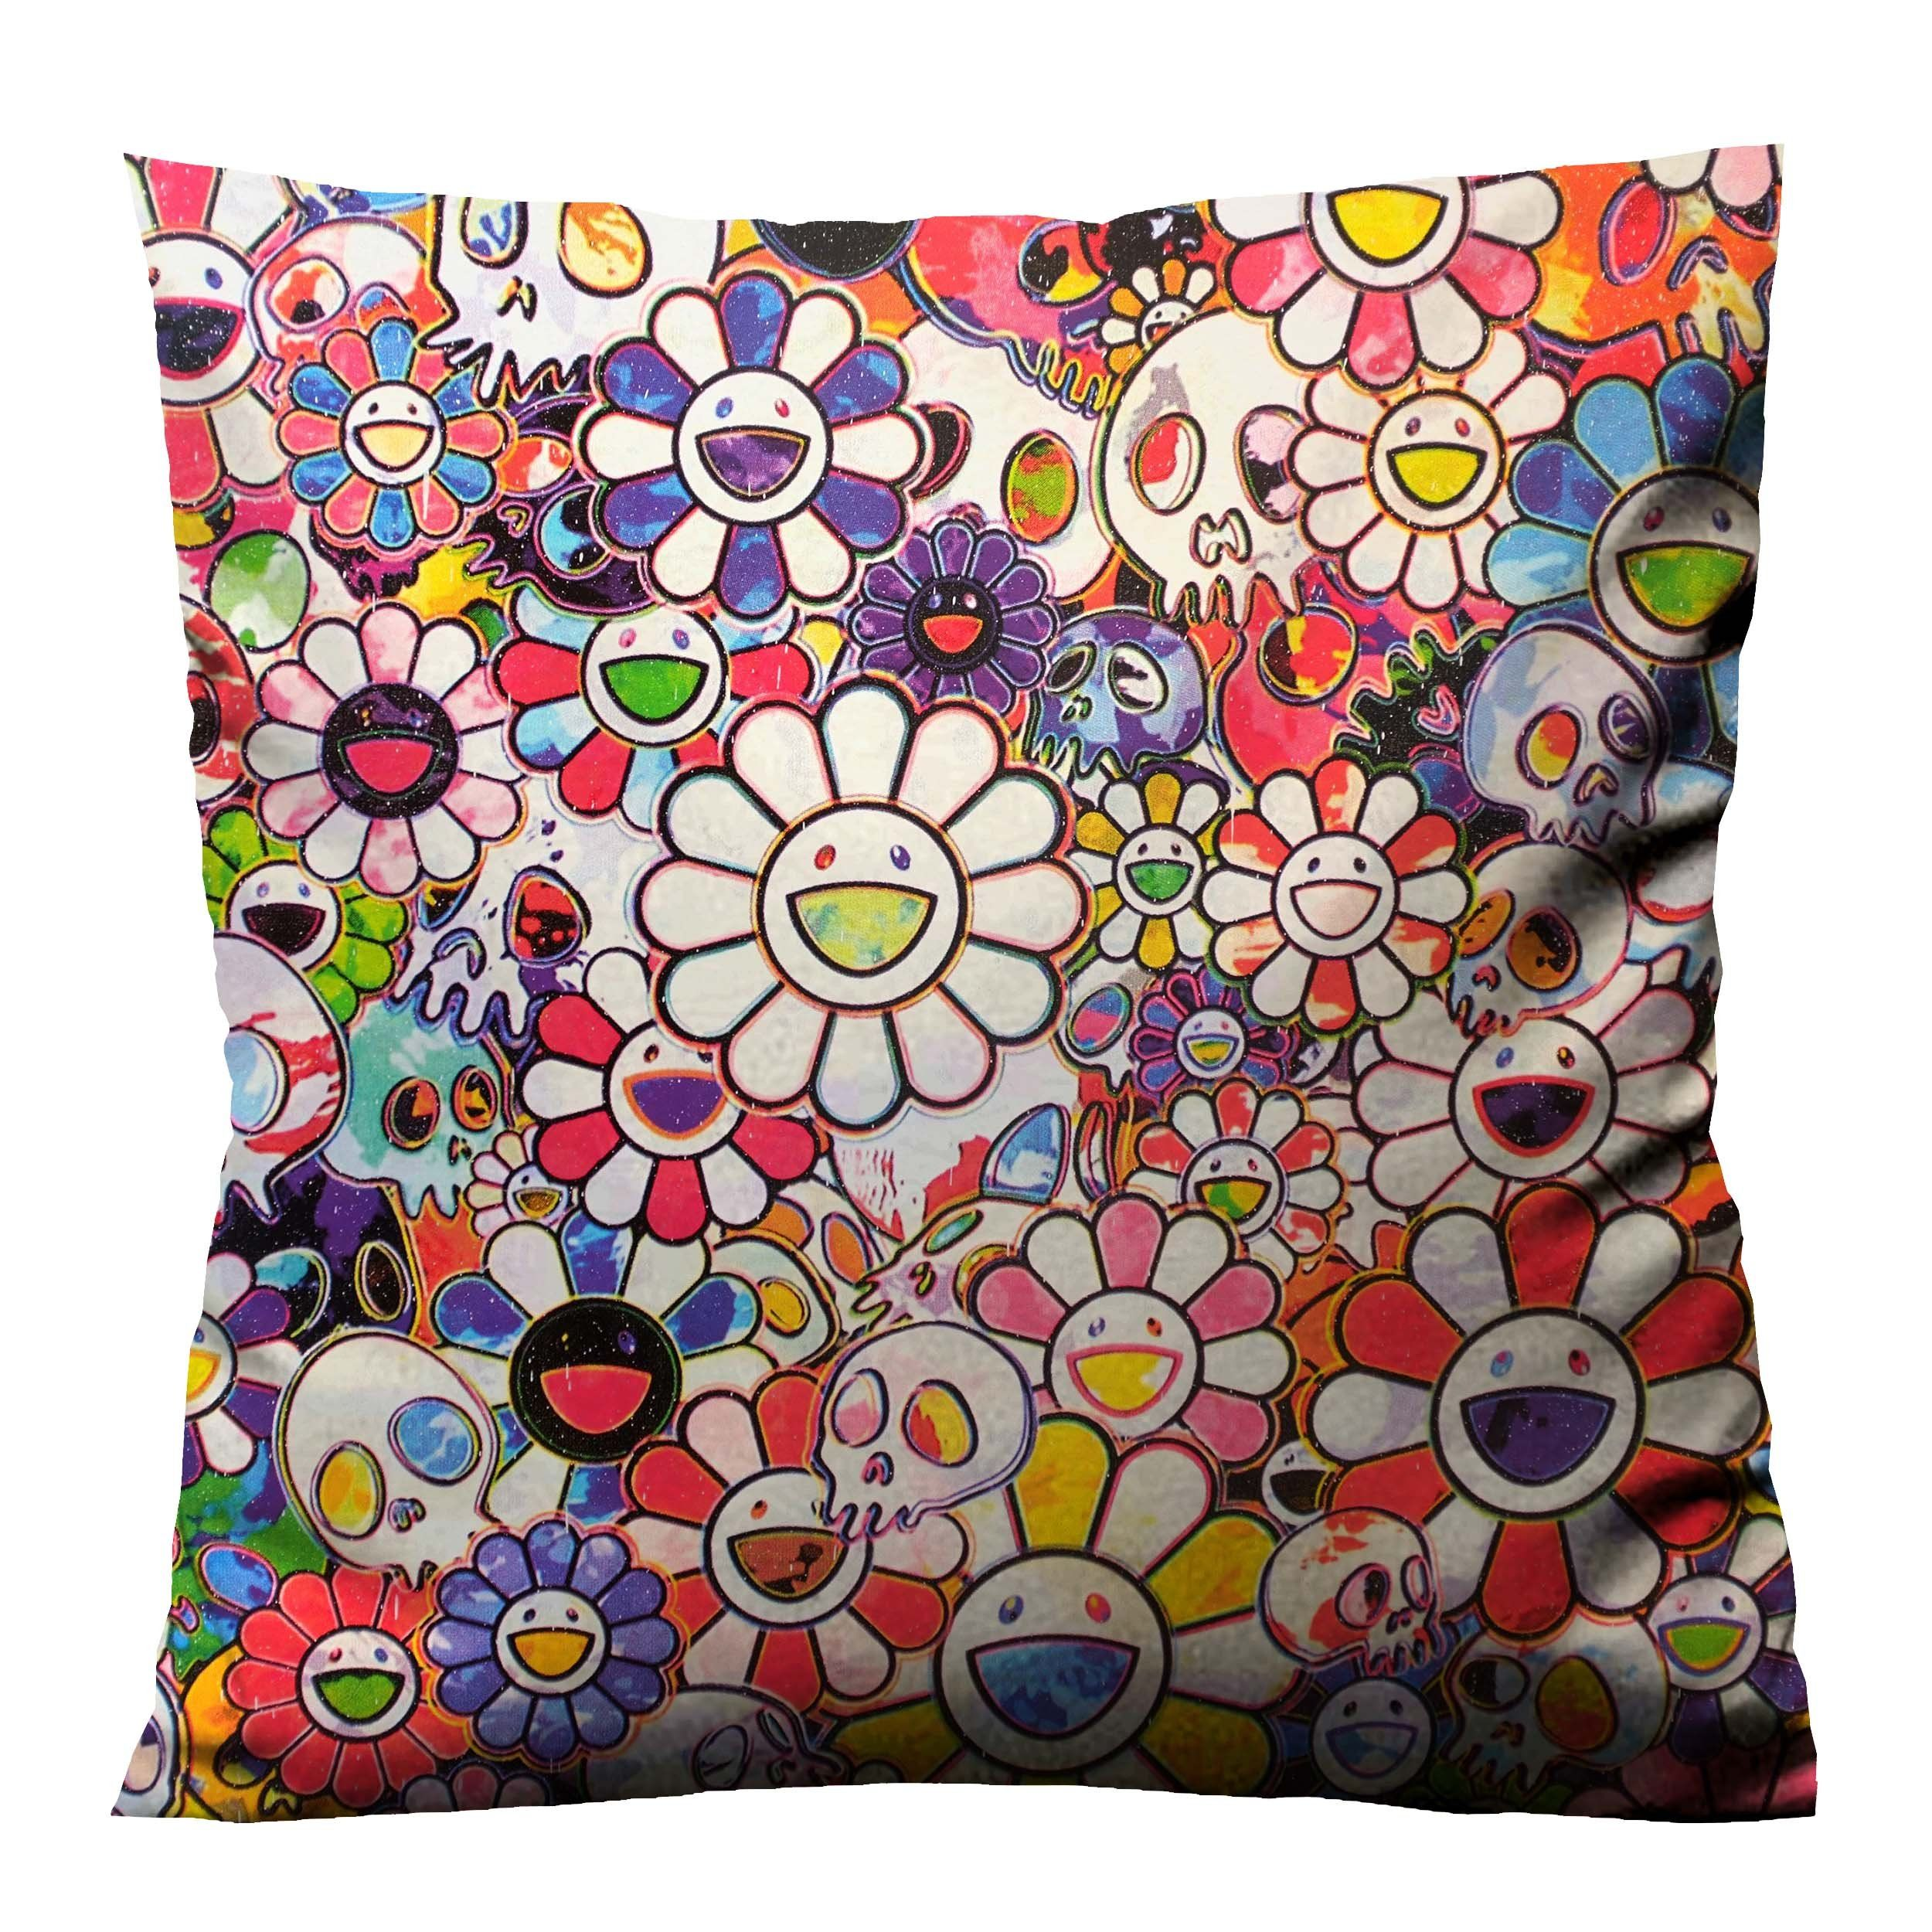 TAKASHI MURAKAMI FLOWERS AND SKULLS Cushion Case Cover di 2020